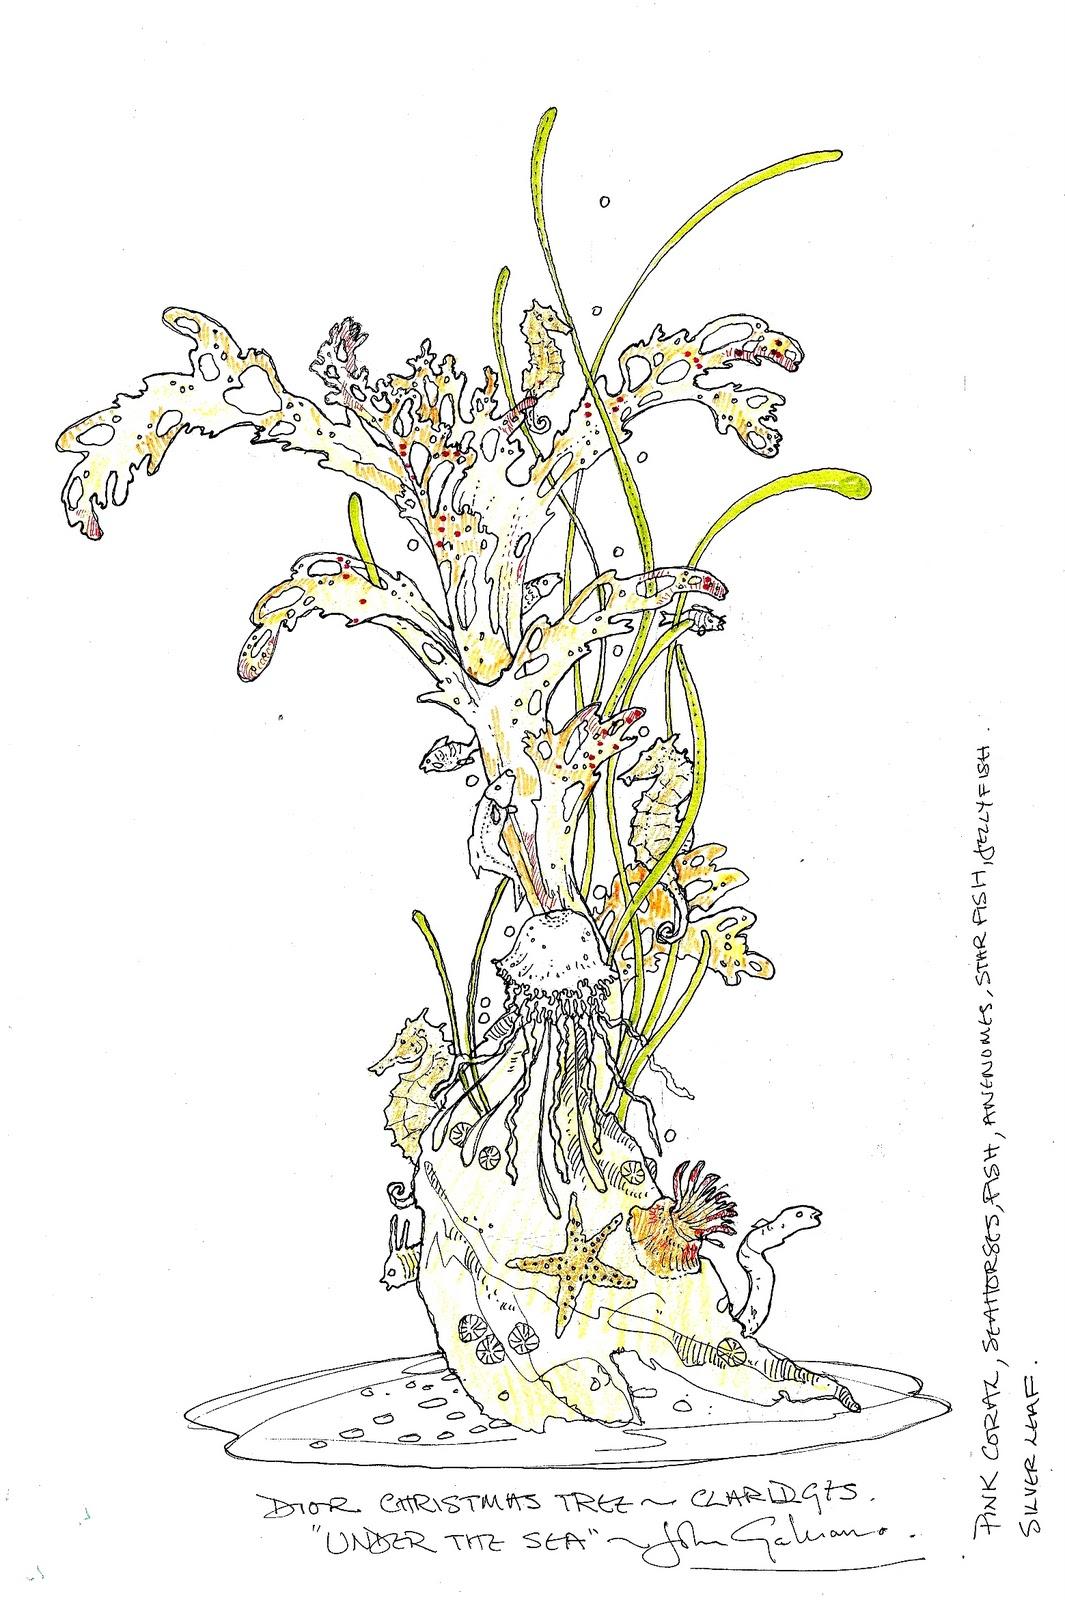 http://2.bp.blogspot.com/_rJ_ESaP5Ha8/TOK_59GNpZI/AAAAAAAAAI8/oyS1TwhpZg0/s1600/Claridge%2527s+Christmas+Tree+by+John+Galliano+for+Dior+--+rendering.jpg